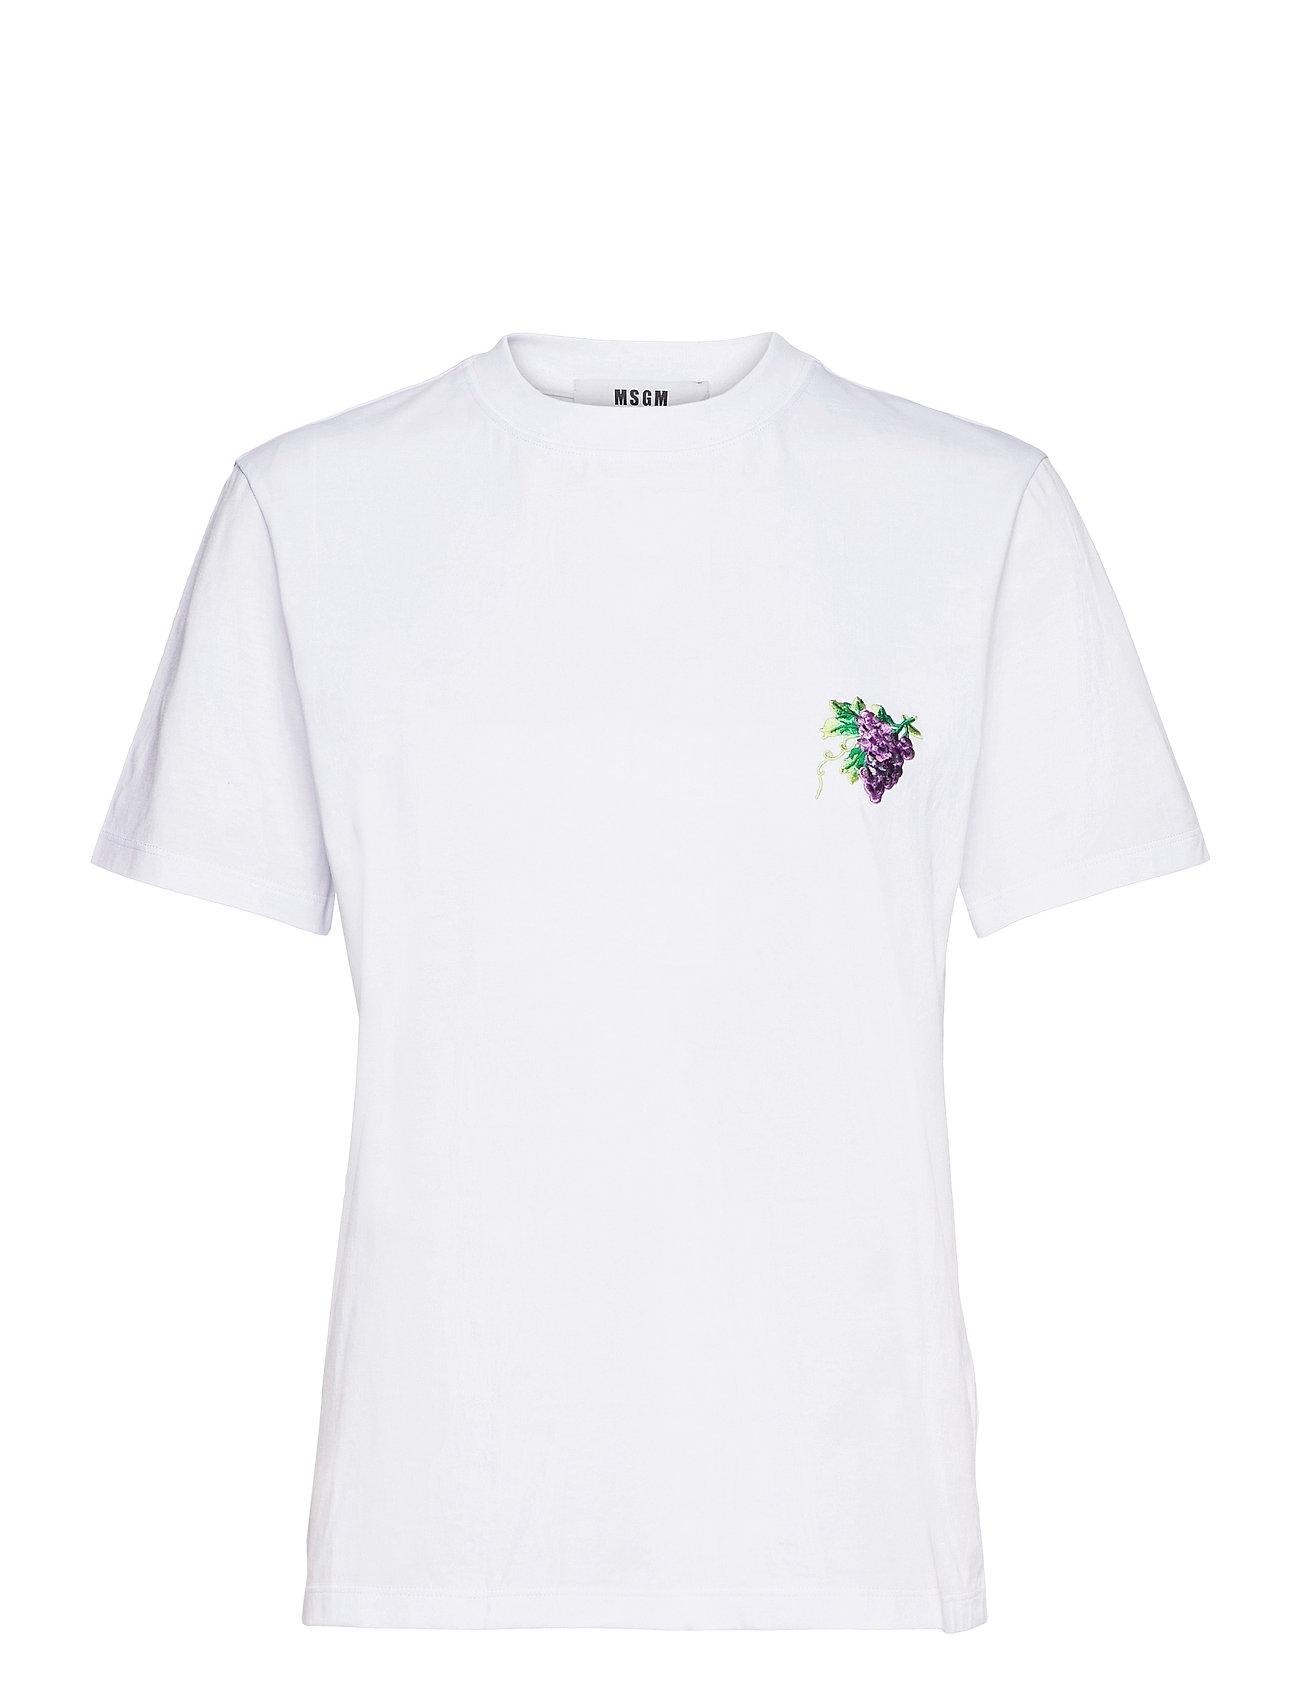 Image of T-Shirt/T-Shirt T-shirt Top Hvid MSGM (3512377635)